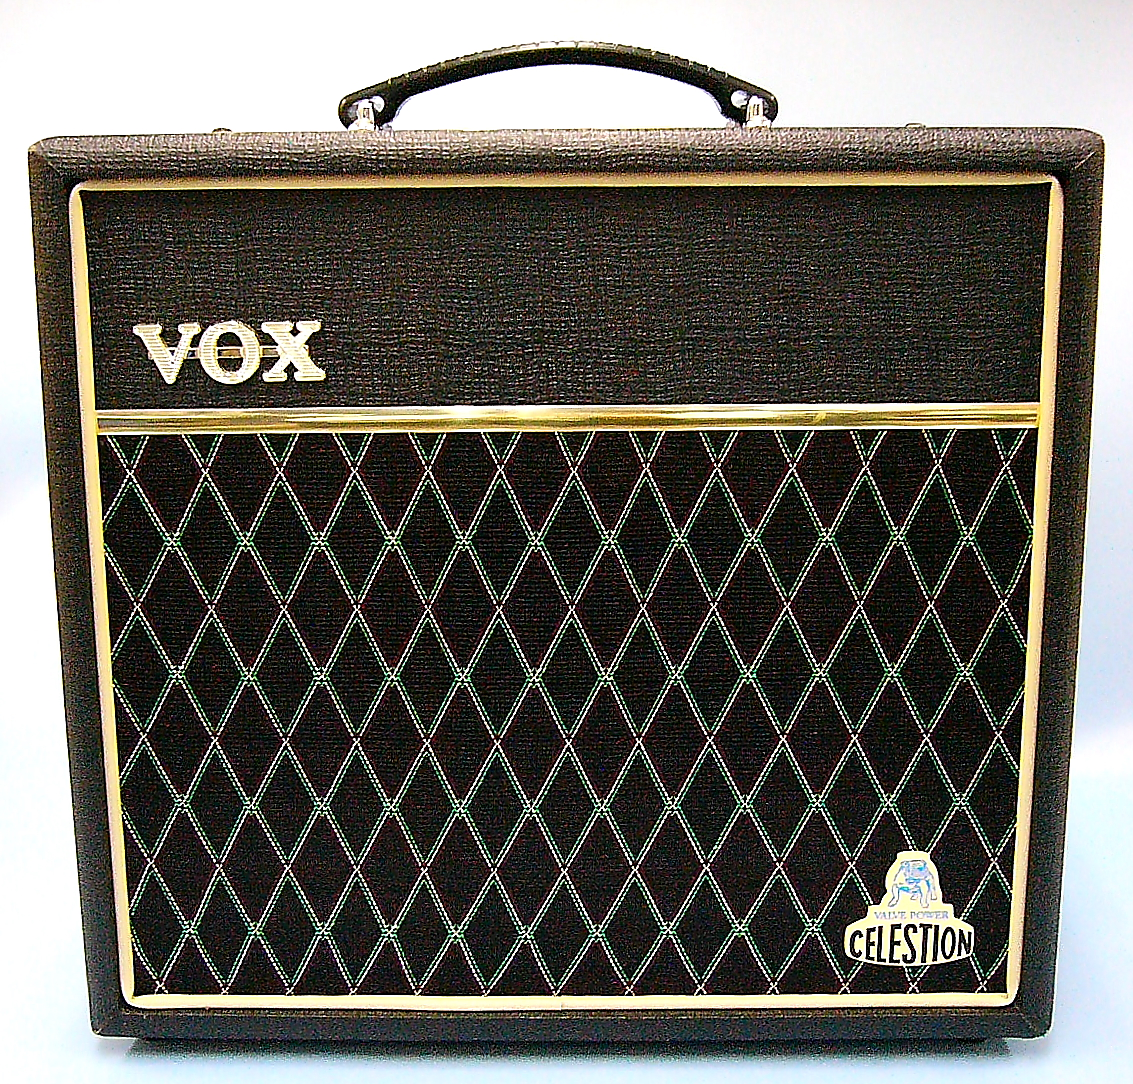 VOX ギターアンプ Cambridge 15 V9159